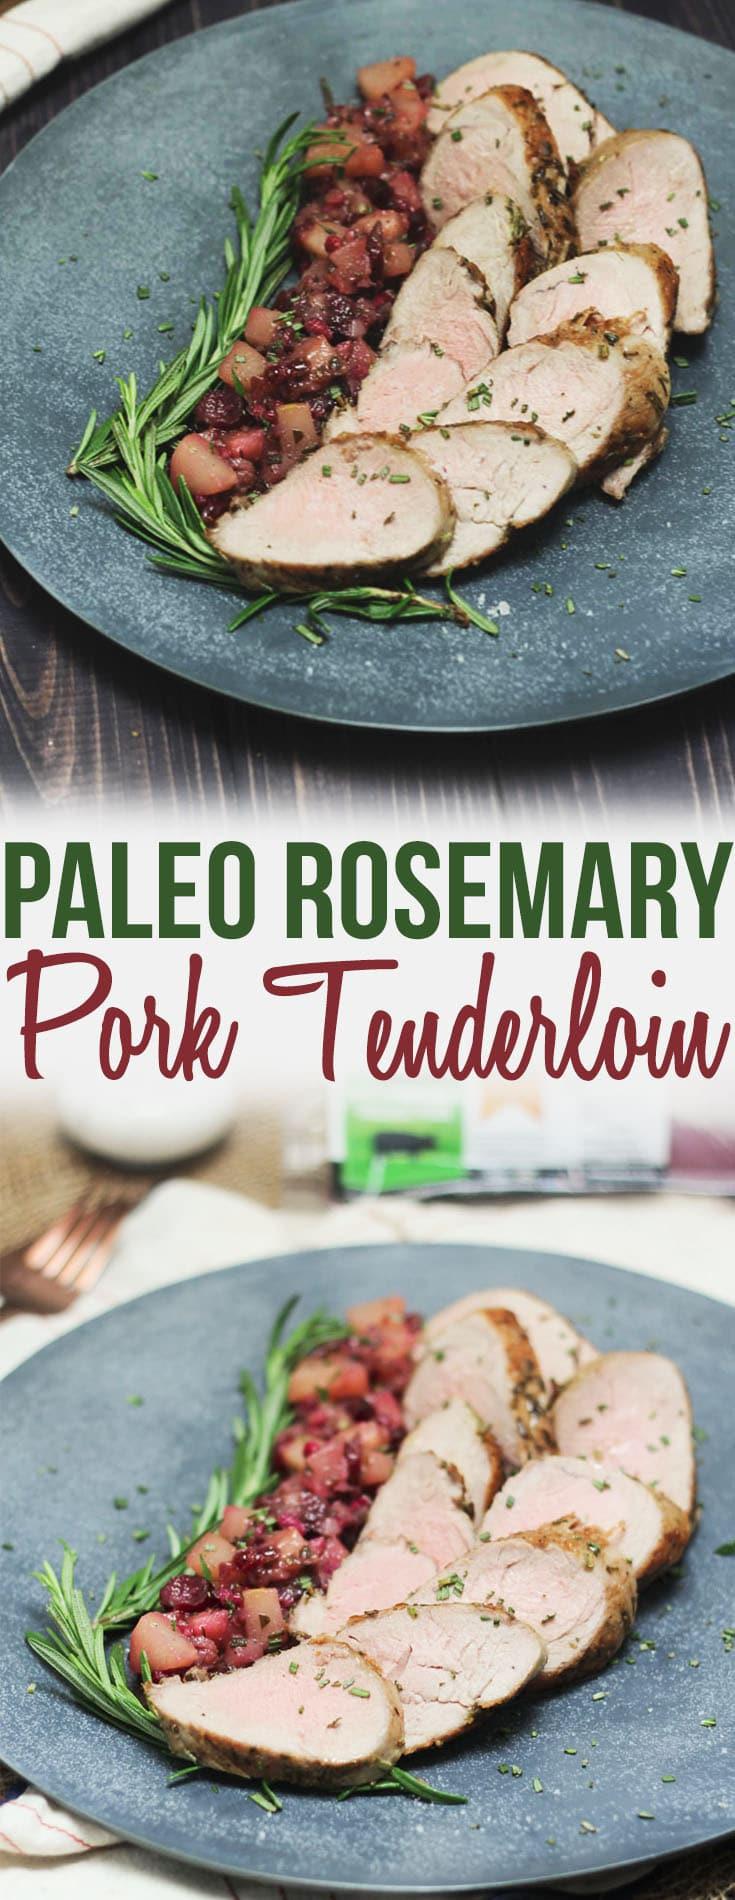 Paleo Pork Tenderloin  Paleo Rosemary Pork Tenderloin with Pear Cranberry